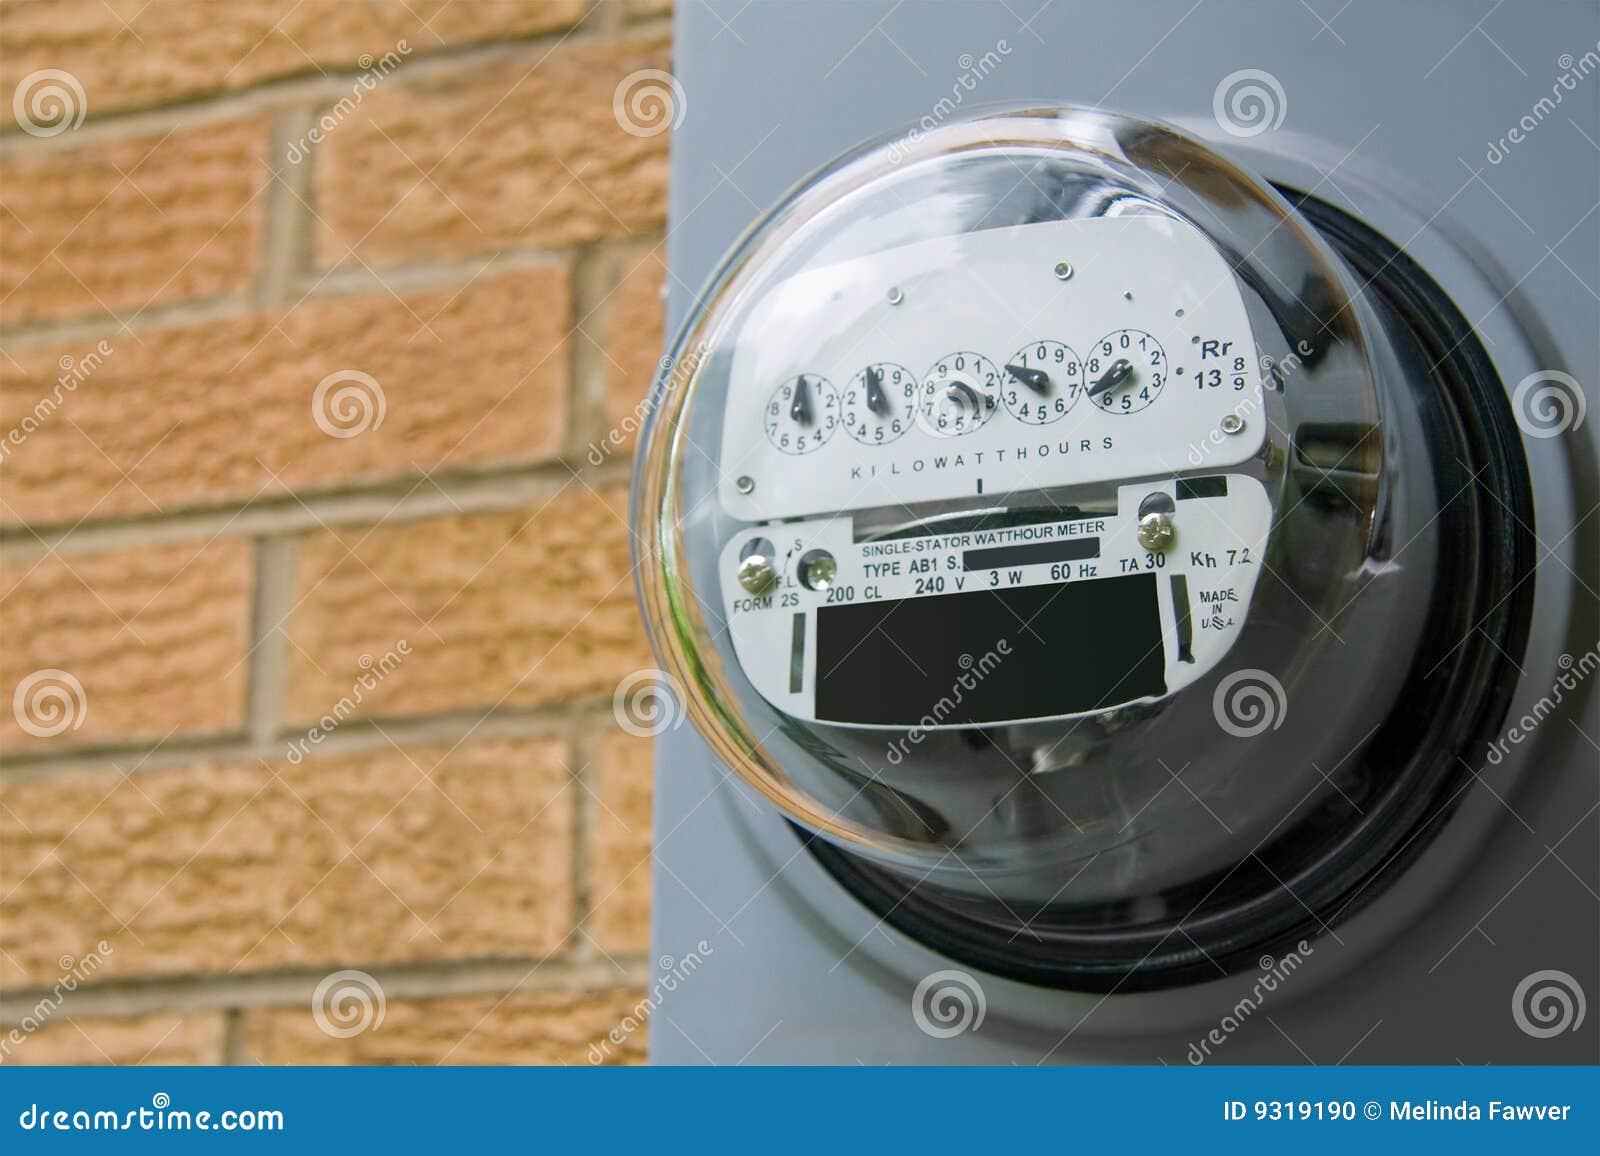 Power Meter Cartoon : Electric meter royalty free stock photography